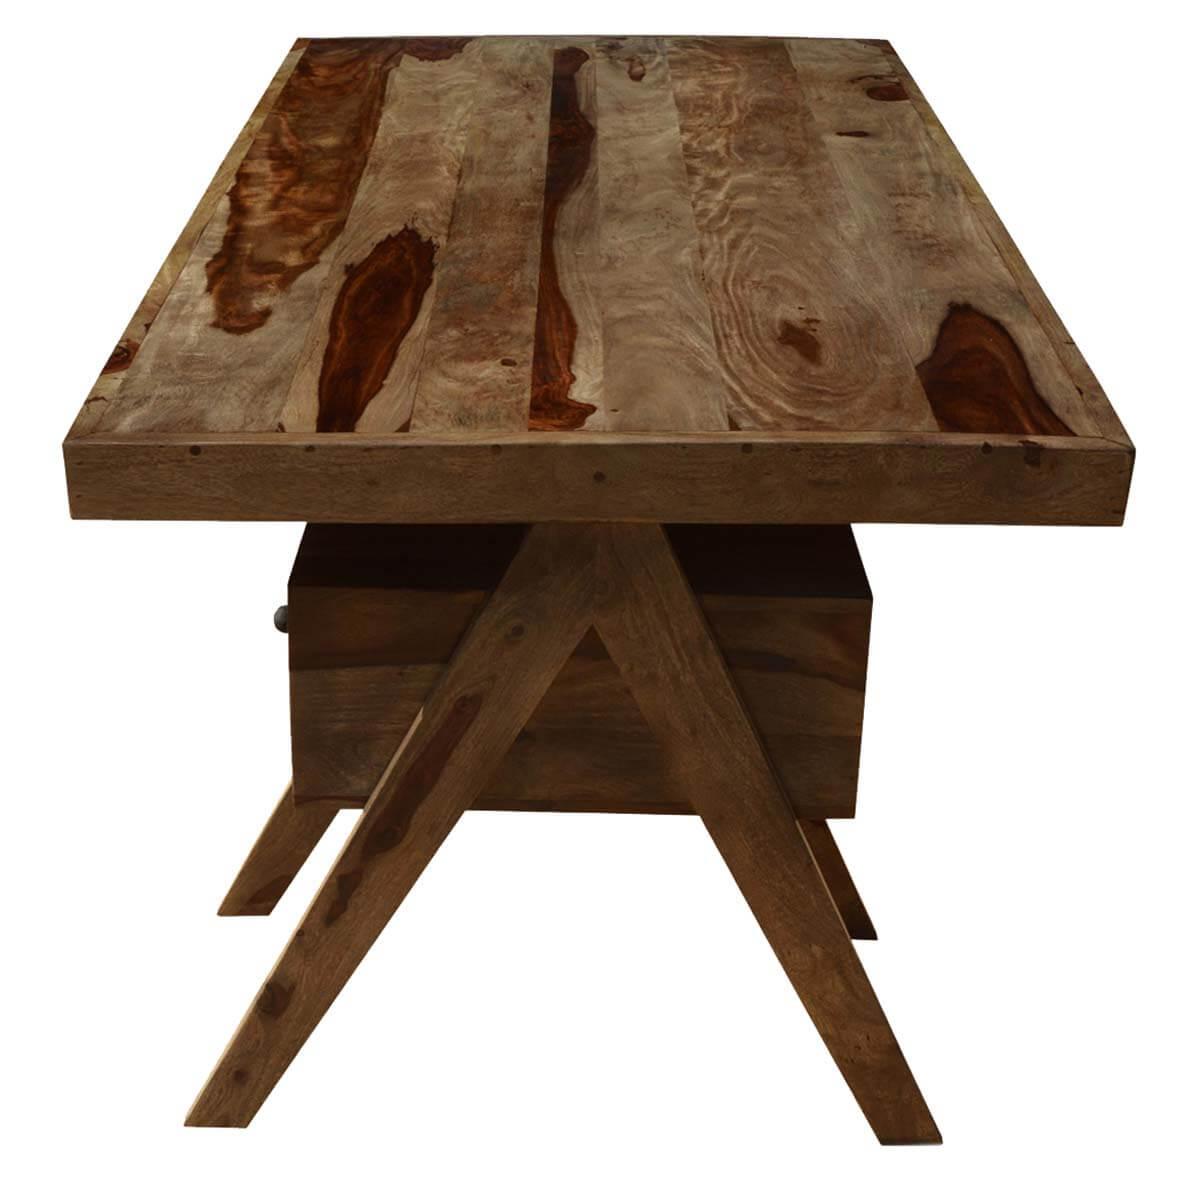 "Rustic Americana Hardwood Executive Desk Home Office: Rustic Artist Solid Wood 72"" Home Office Executive Desk"